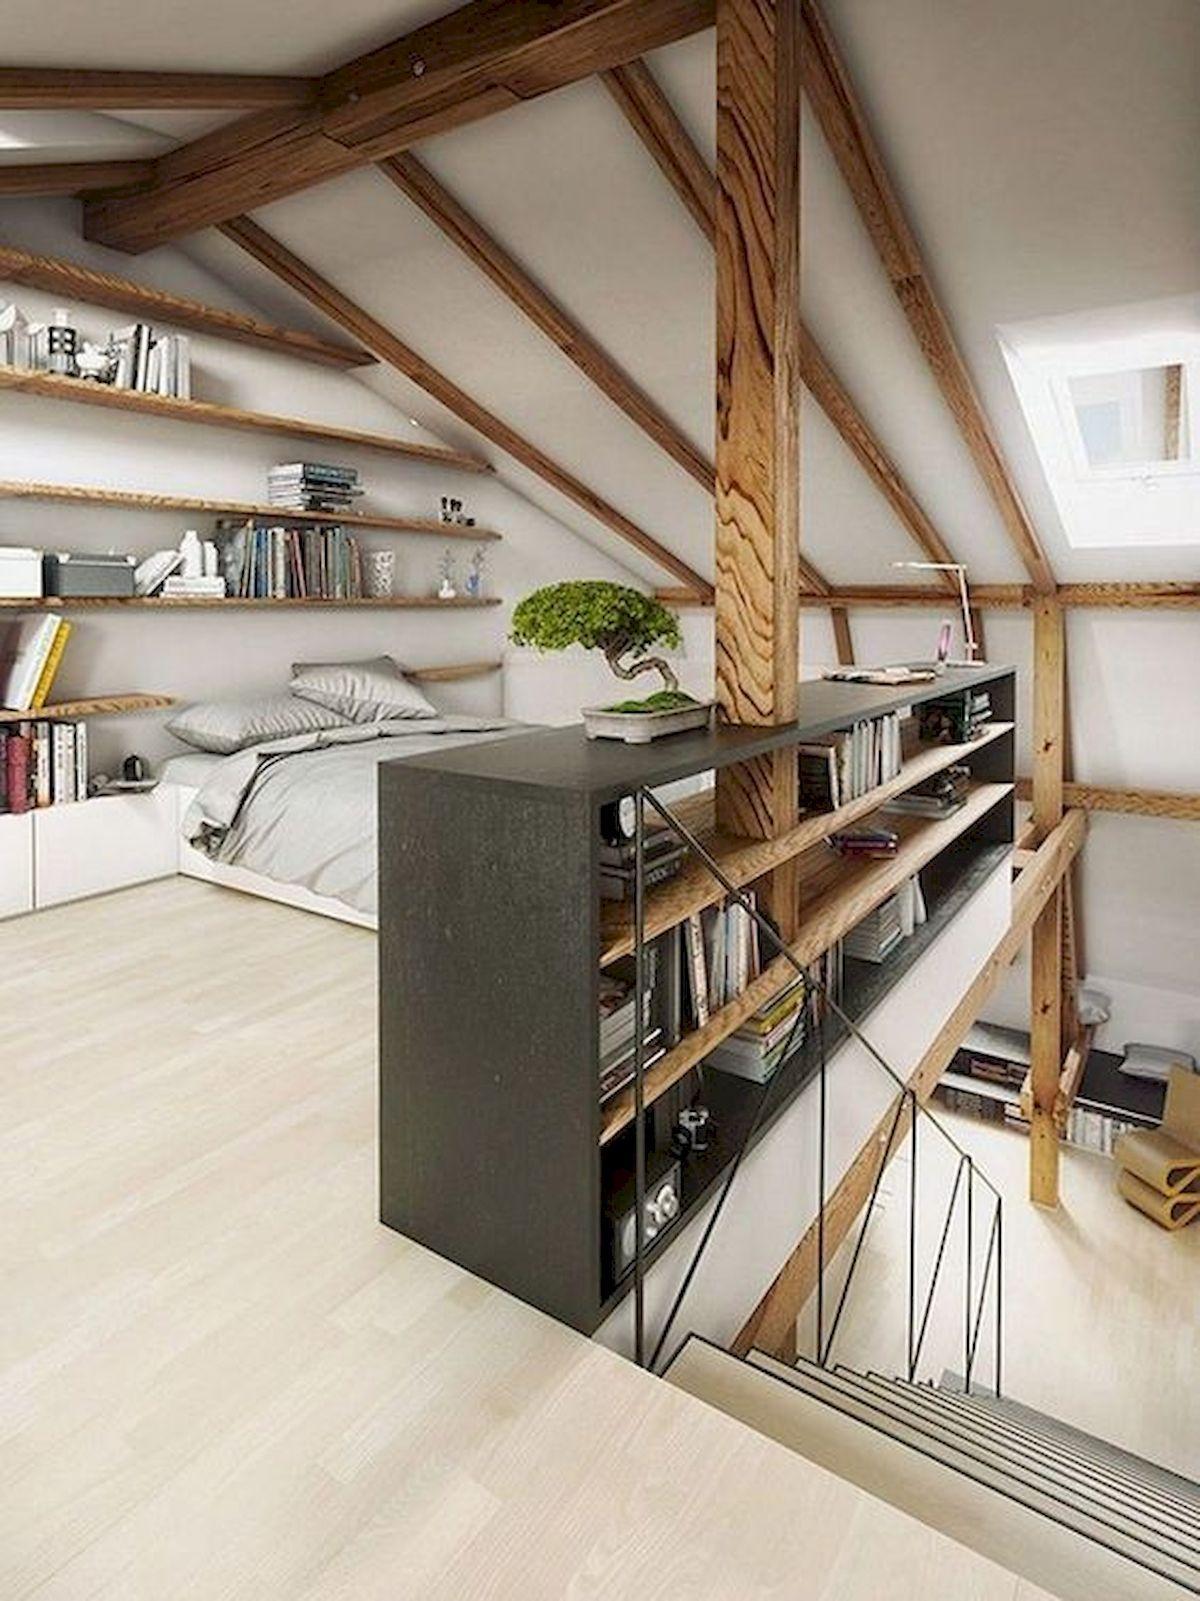 40 Beautiful Attic Bedroom Design and Decorating Ideas